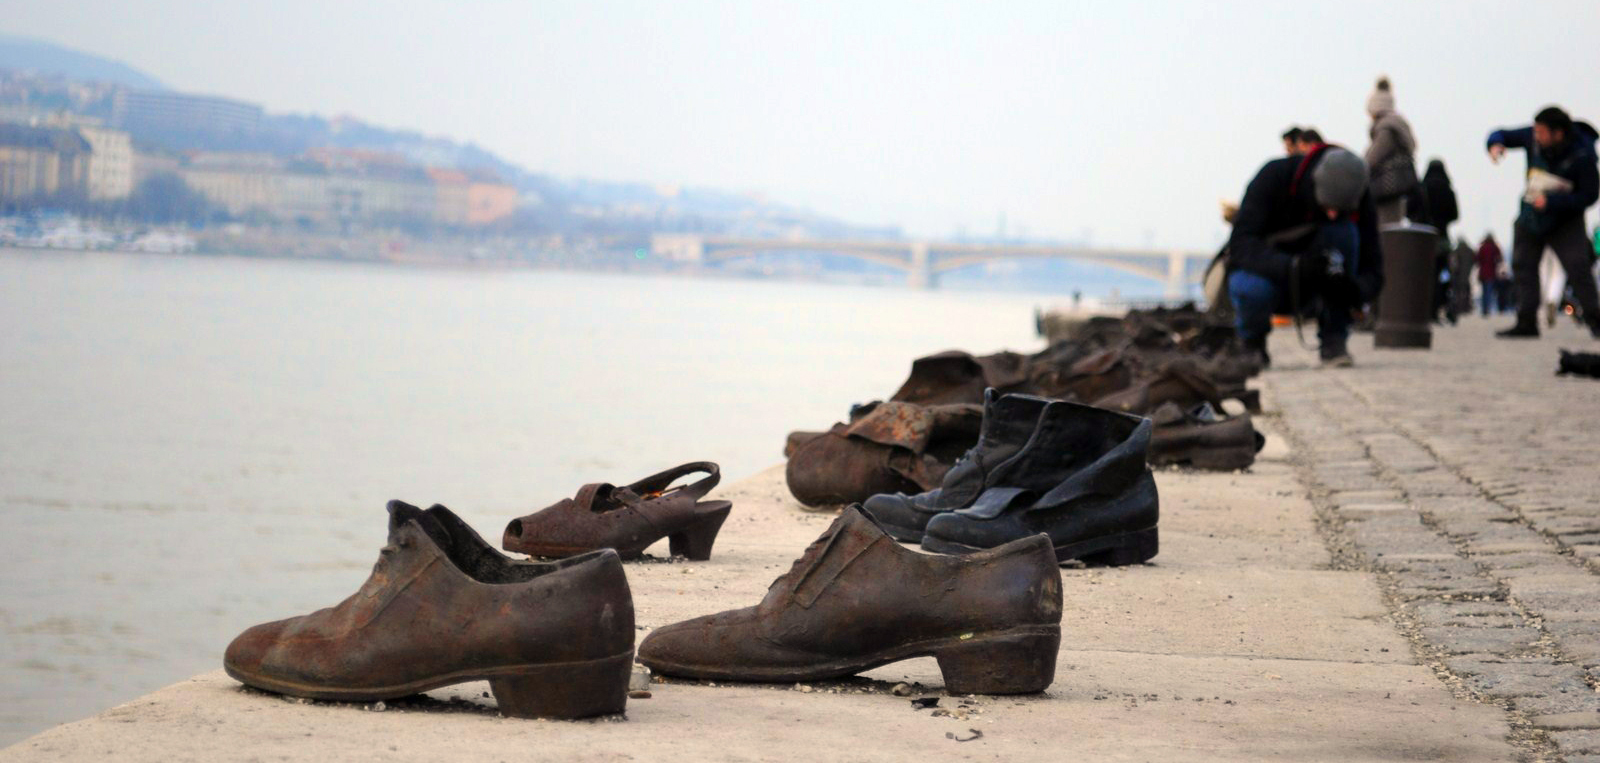 Qué ver en Budapest en un fin de semana: Monumento a los Judíos budapest en un fin de semana - 21411352912 4958a1661e o - Qué ver en Budapest en un fin de semana